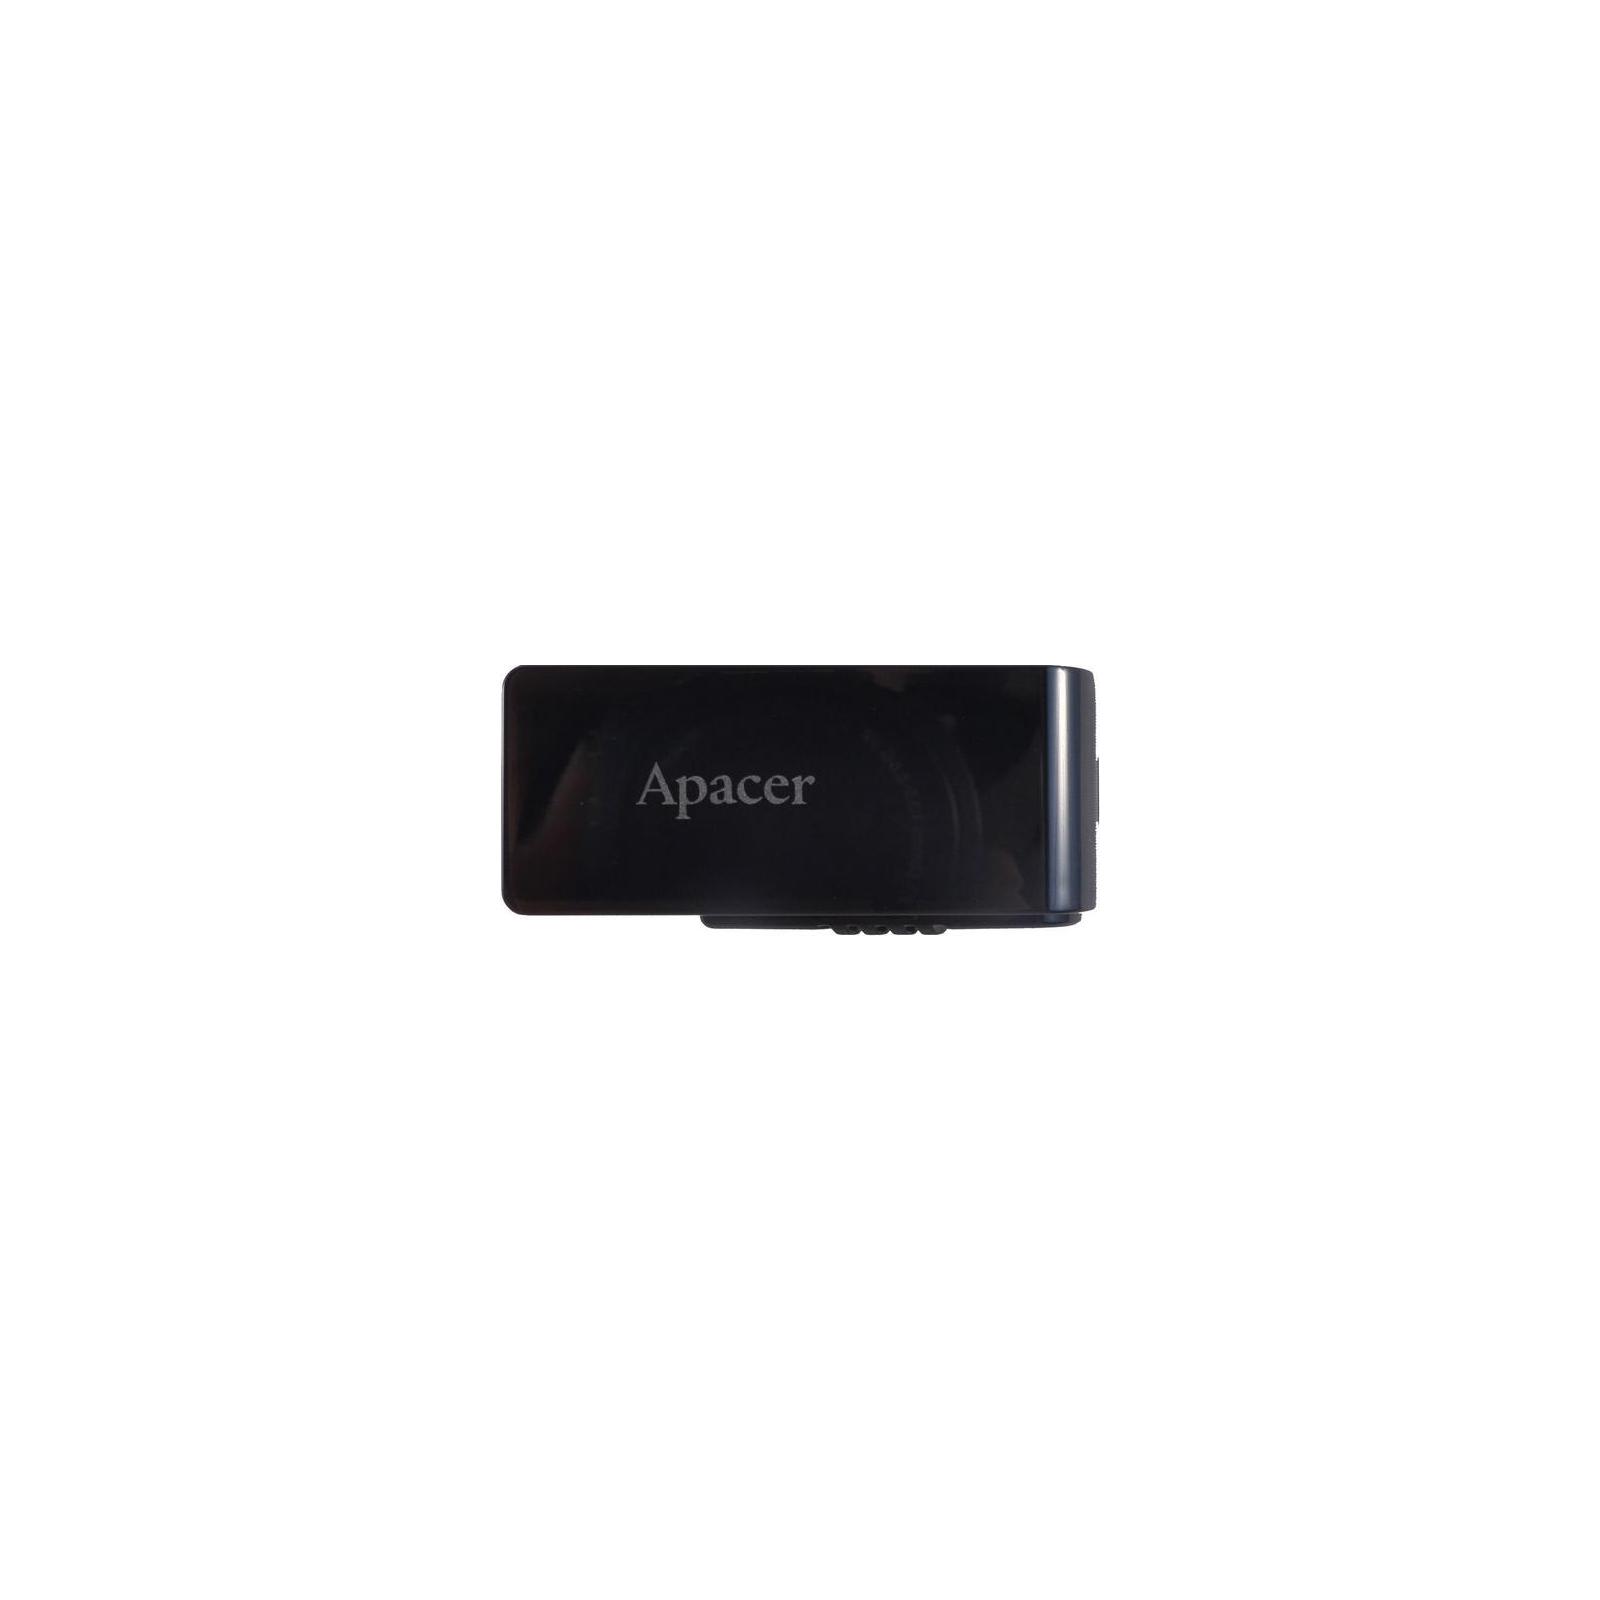 USB флеш накопитель 16GB AH350 Black RP USB3.0 Apacer (AP16GAH350B-1)